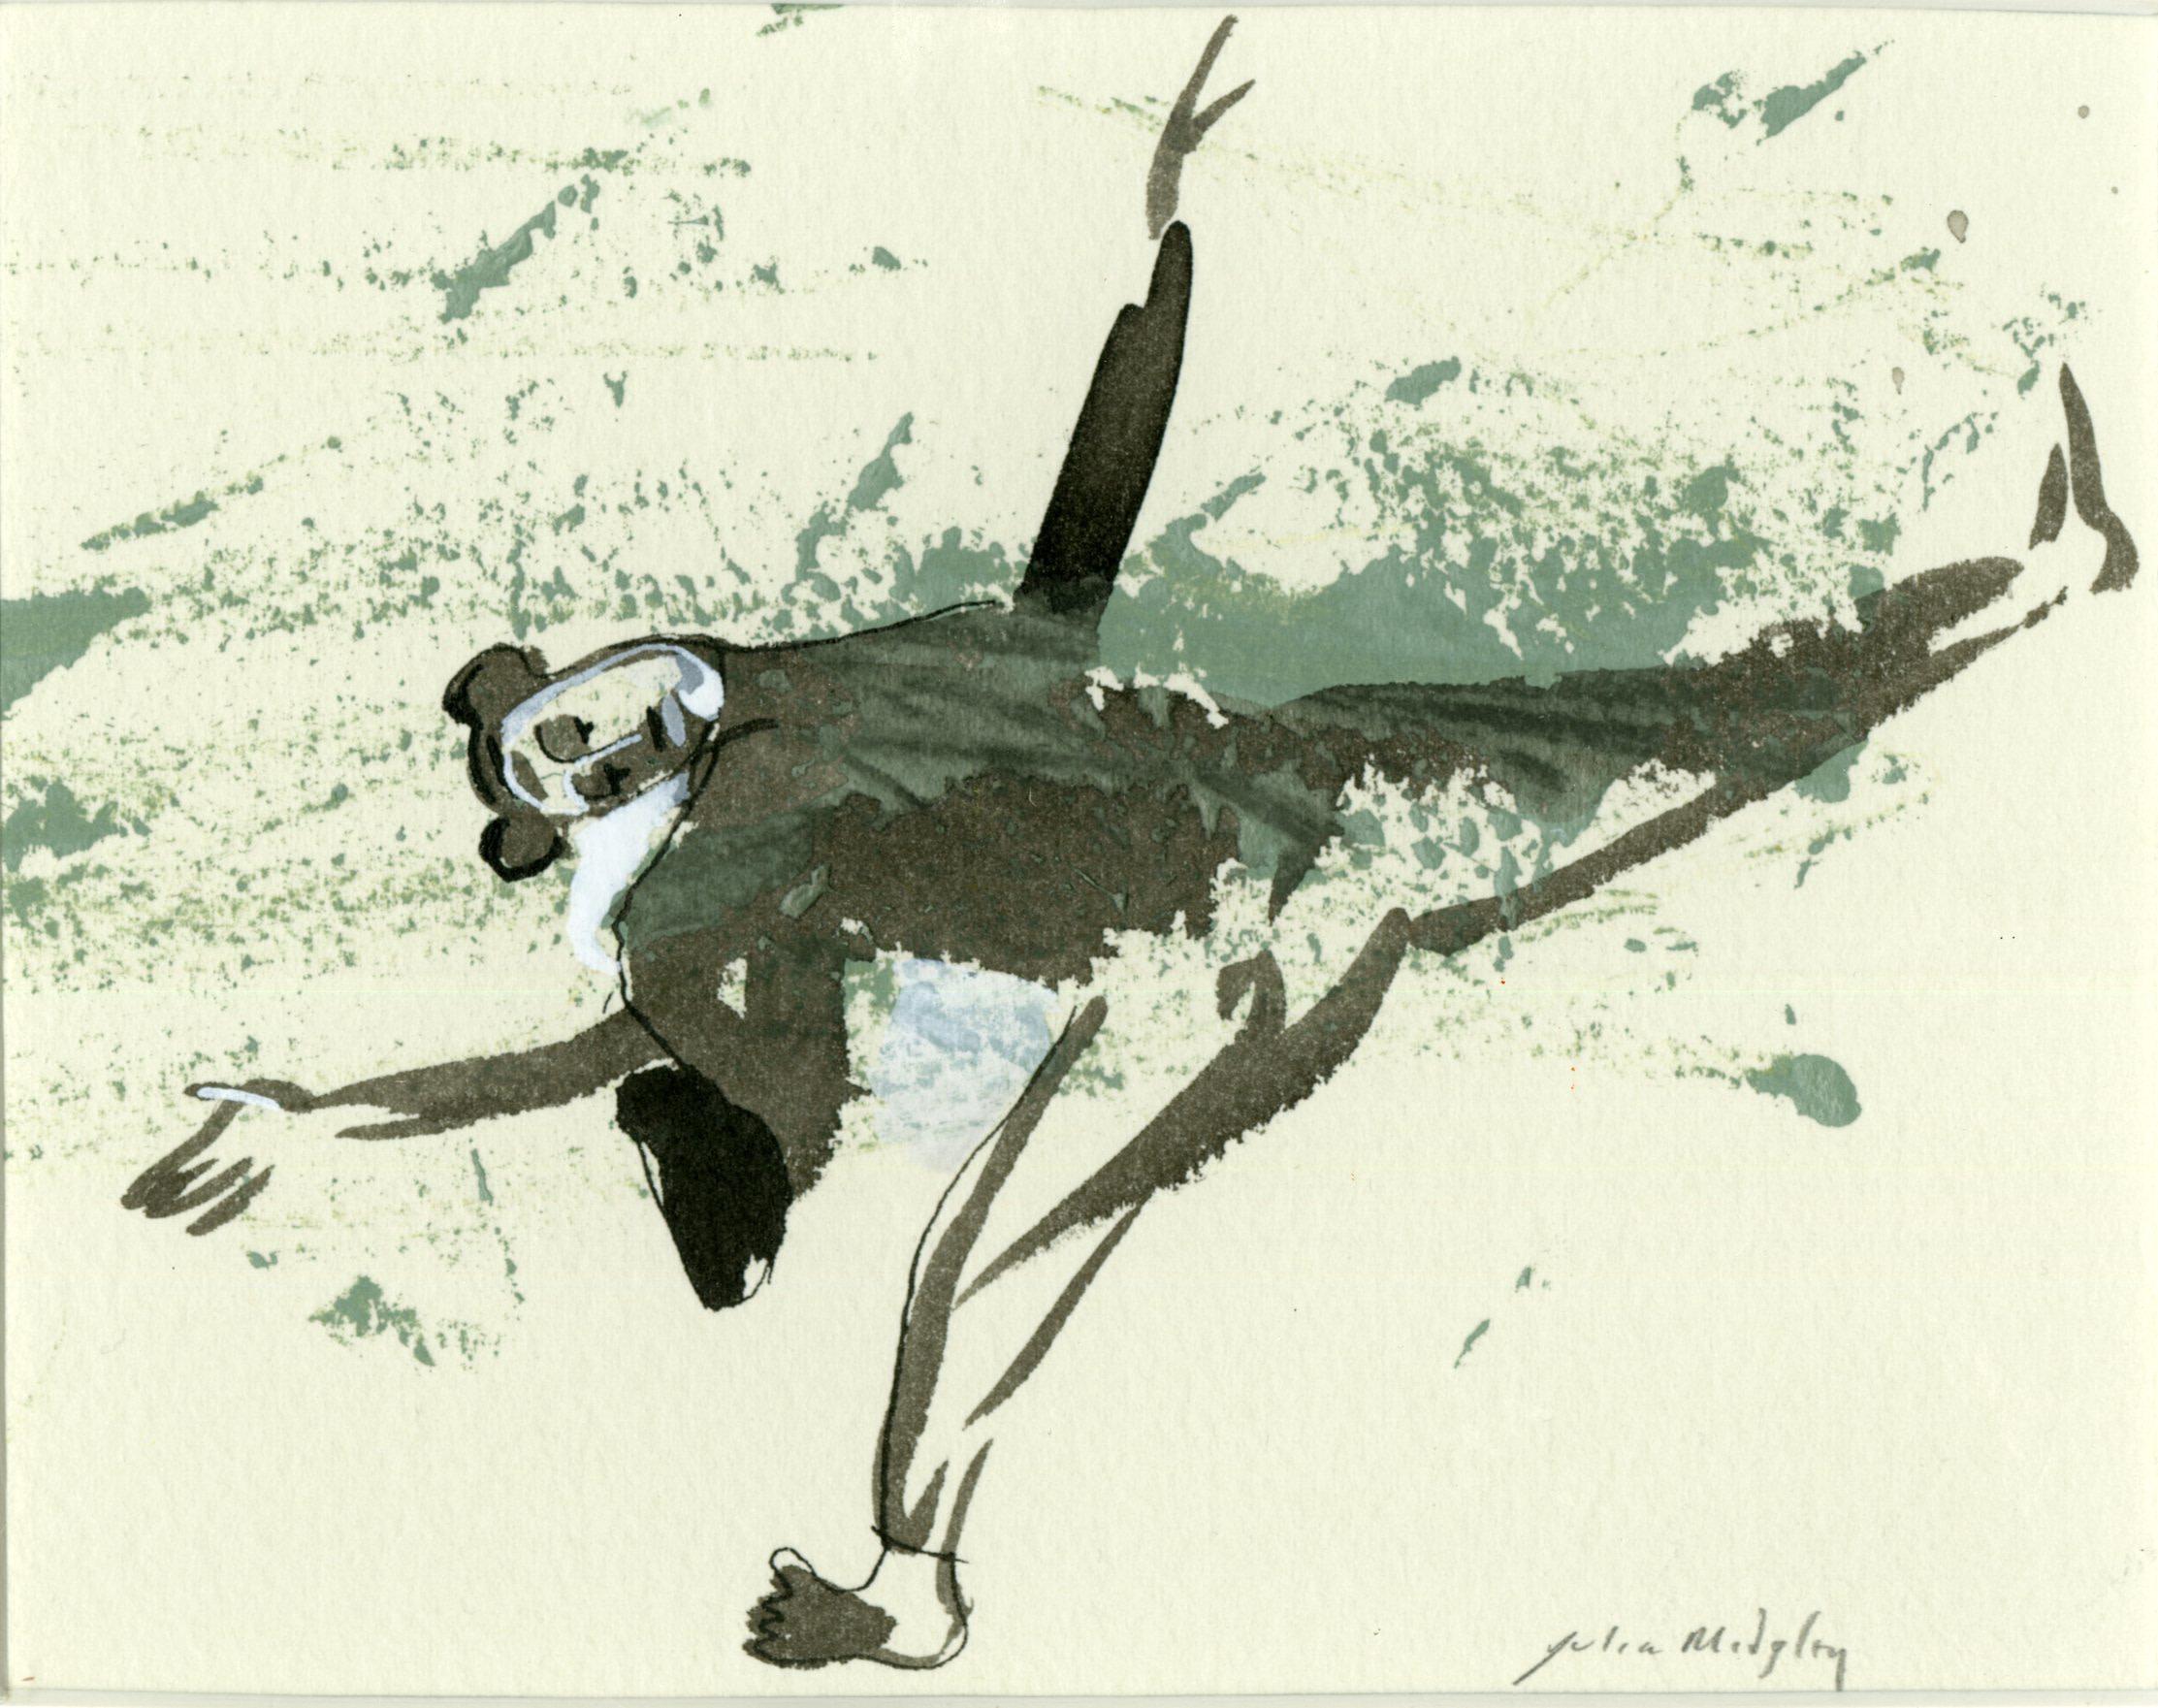 "<span class=""link fancybox-details-link""><a href=""/artists/150-julia-midgley/works/12537-julia-midgley-kimono-dancer/"">View Detail Page</a></span><div class=""artist""><span class=""artist""><strong>Julia Midgley</strong></span></div><div class=""title""><em>Kimono Dancer</em></div><div class=""medium"">ink & watercolour</div><div class=""dimensions"">Frame: 27 x 31 cm<br /> Artwork: 17 x 20 cm</div><div class=""price"">£290.00</div>"